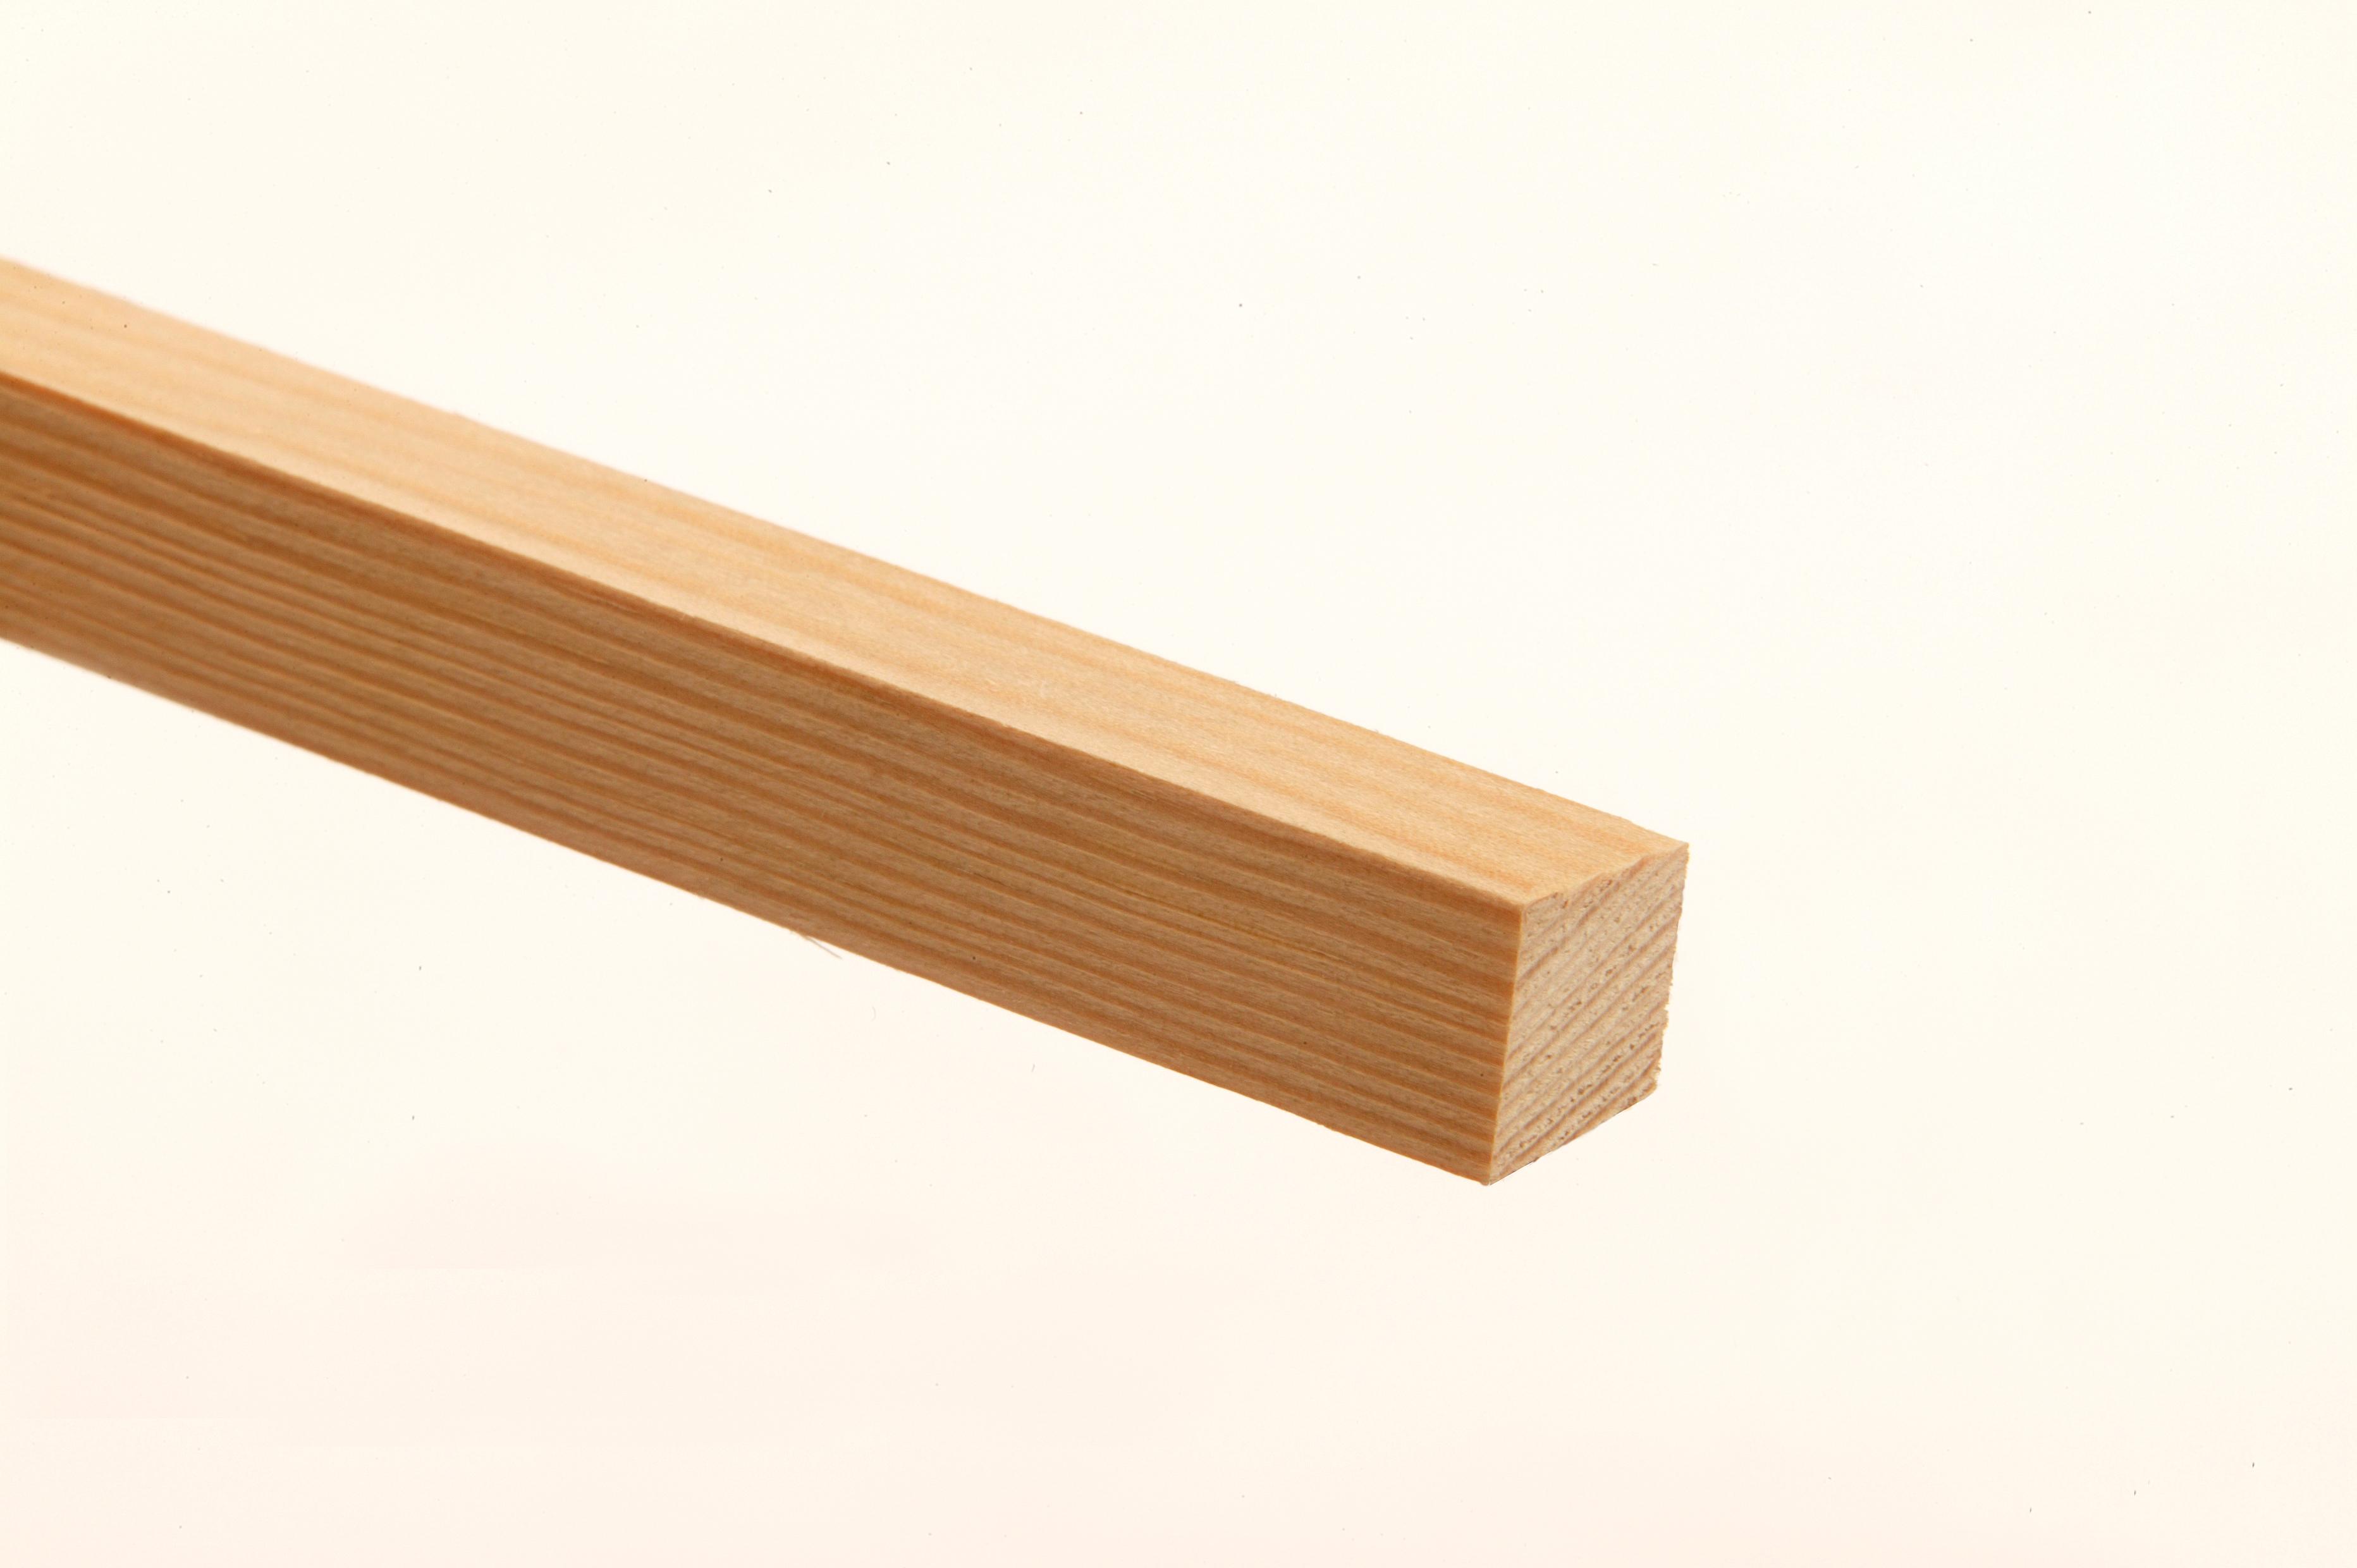 10 Pine PSE Stripwood 34 x 34 x 2400mm